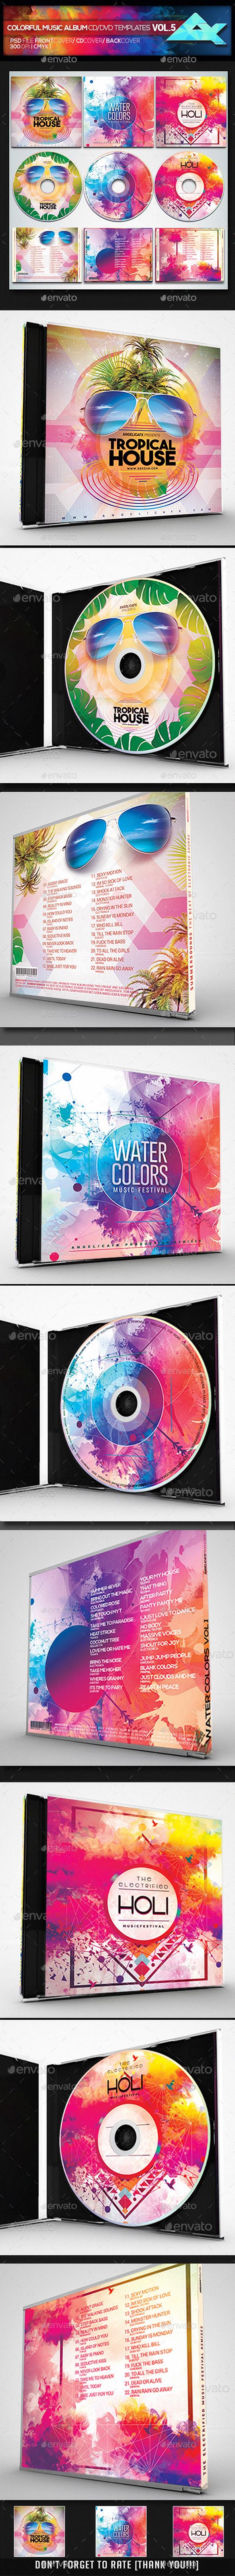 Colorful CD/DVD Album Covers Bundle Vol. 5 - CD & DVD Artwork Print Templates